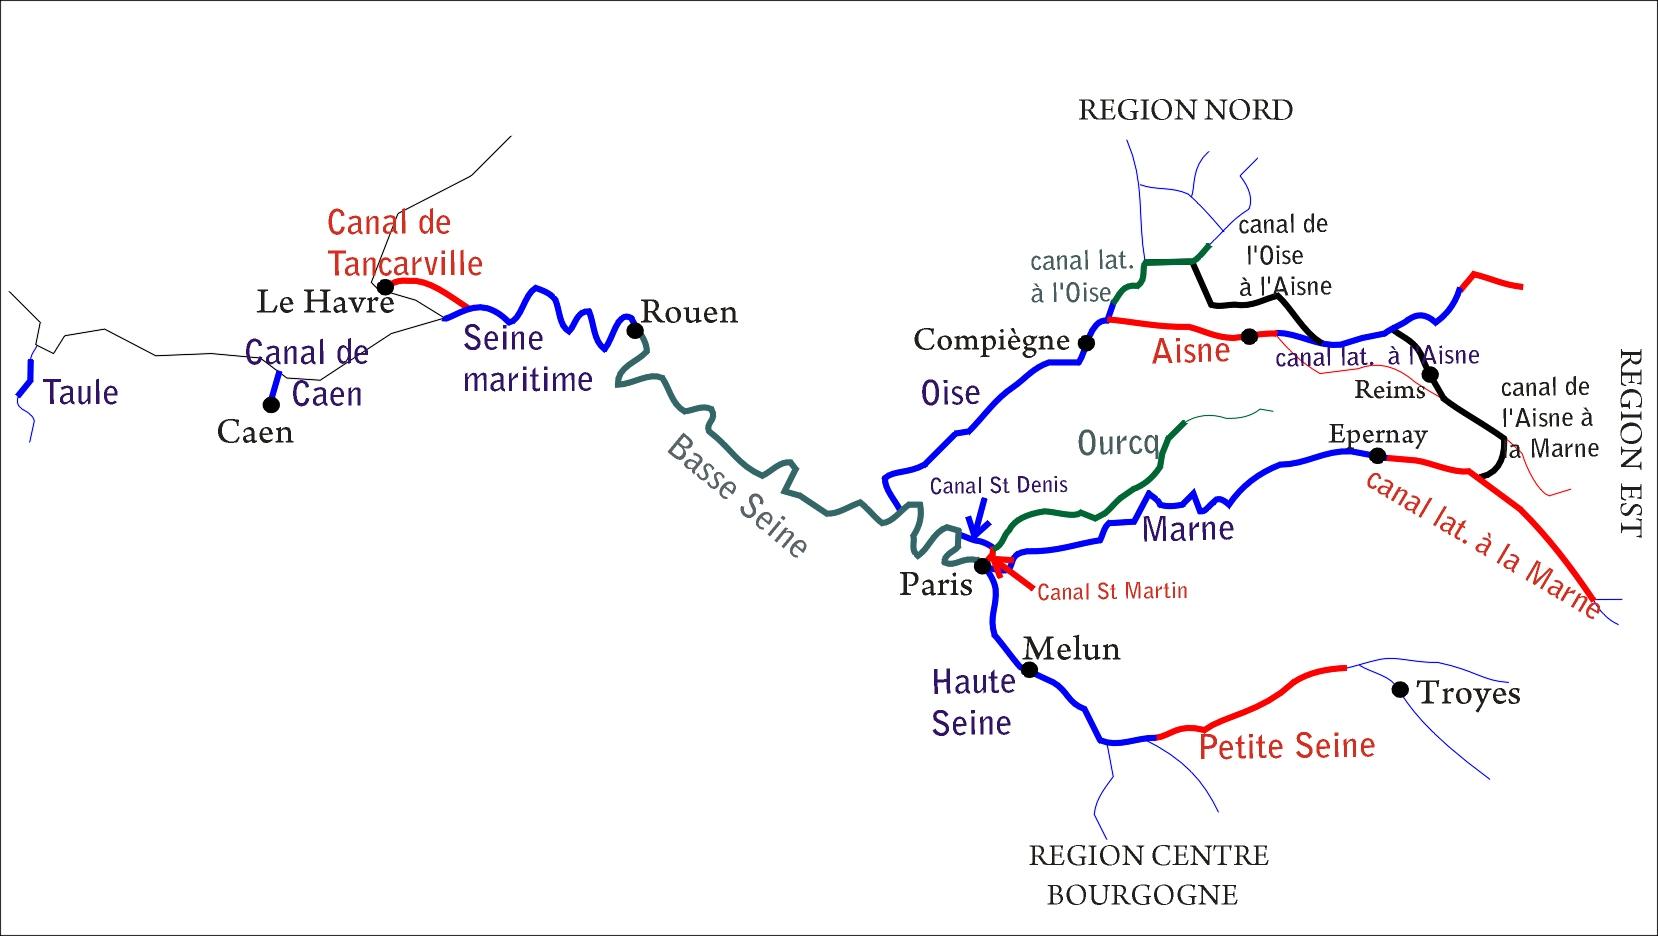 File:Voies navigables seine.jpg - Wikimedia Commons